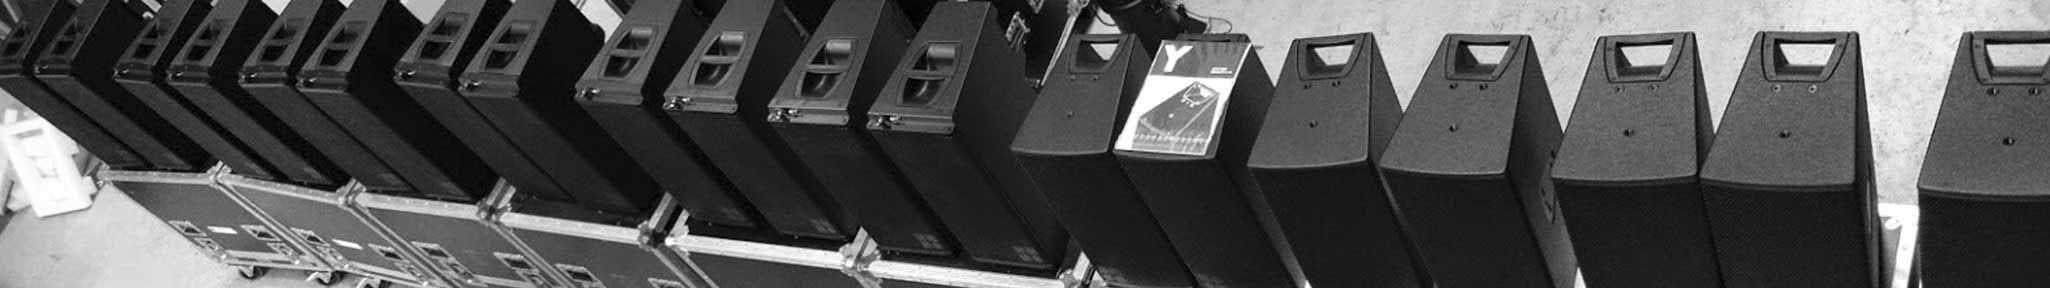 Sonorisation - d&b Audiotechnik